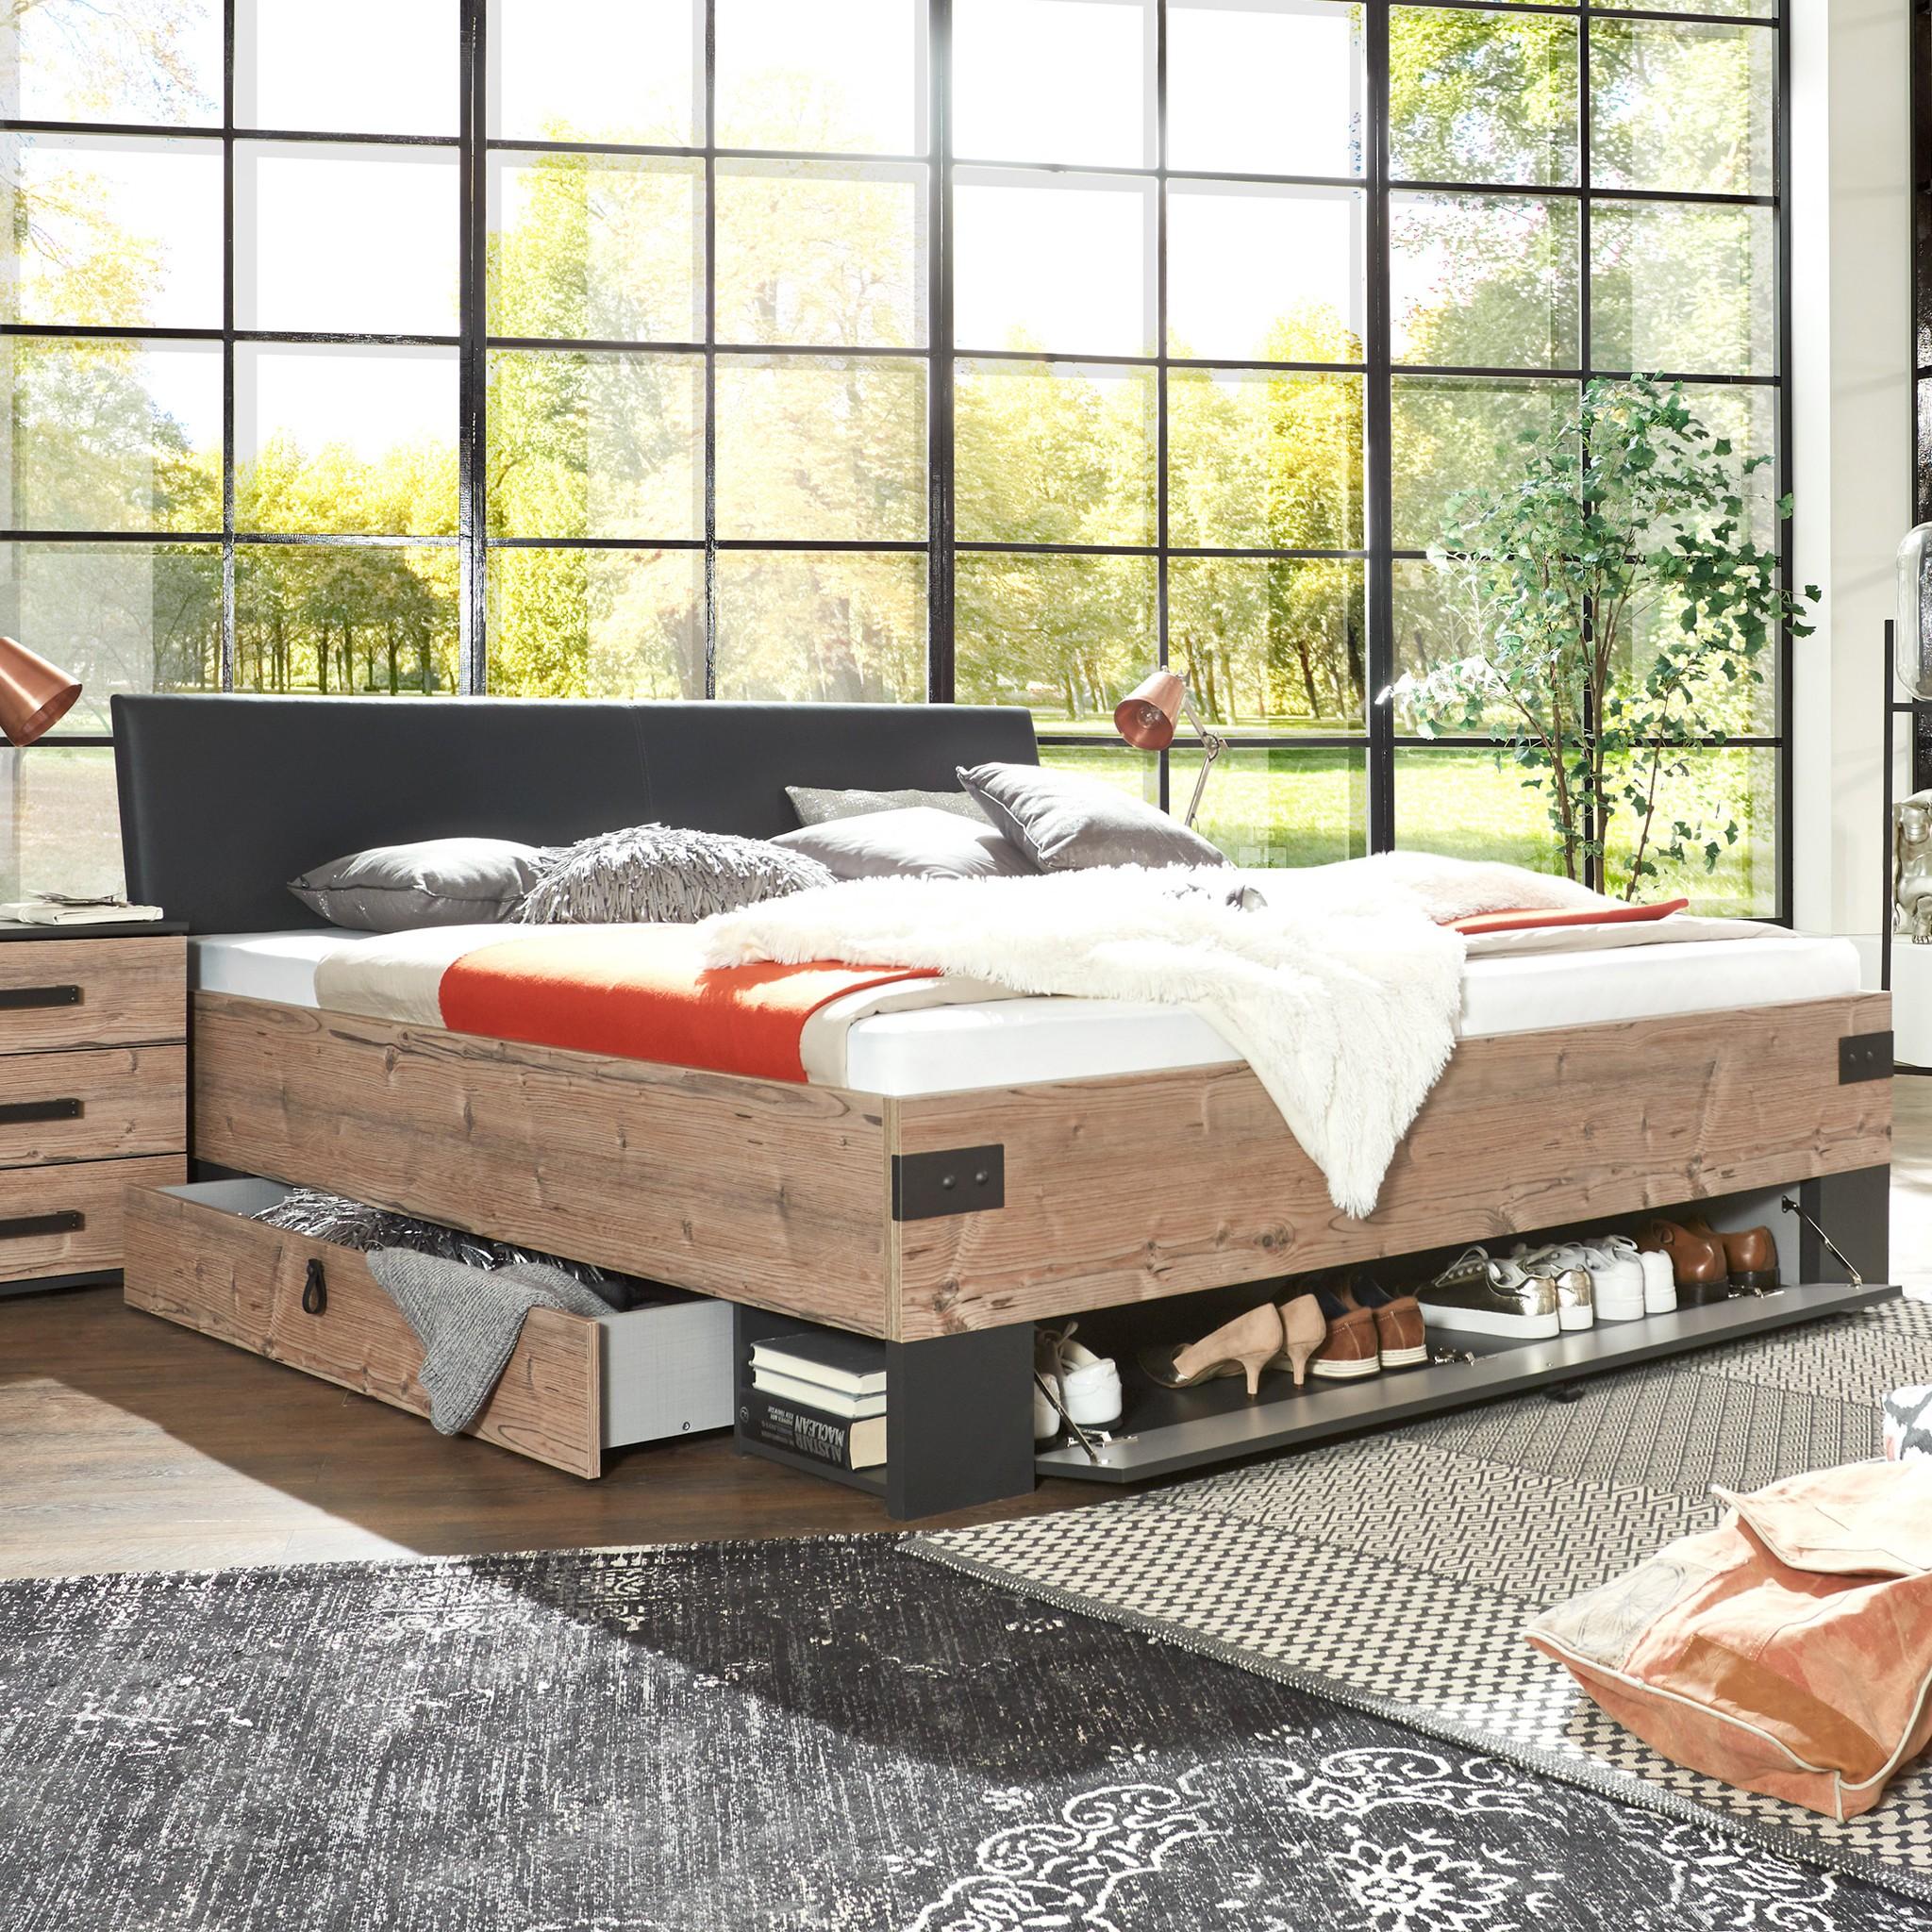 Full Size of Bett Weiß 180x200 Massivholz Betten Steens 220 X 200 Topper Ausgefallene Bei Ikea Günstige 140x200 200x200 Komforthöhe Mit Aufbewahrung 120 Cm Breit Bett Stauraum Bett 200x200